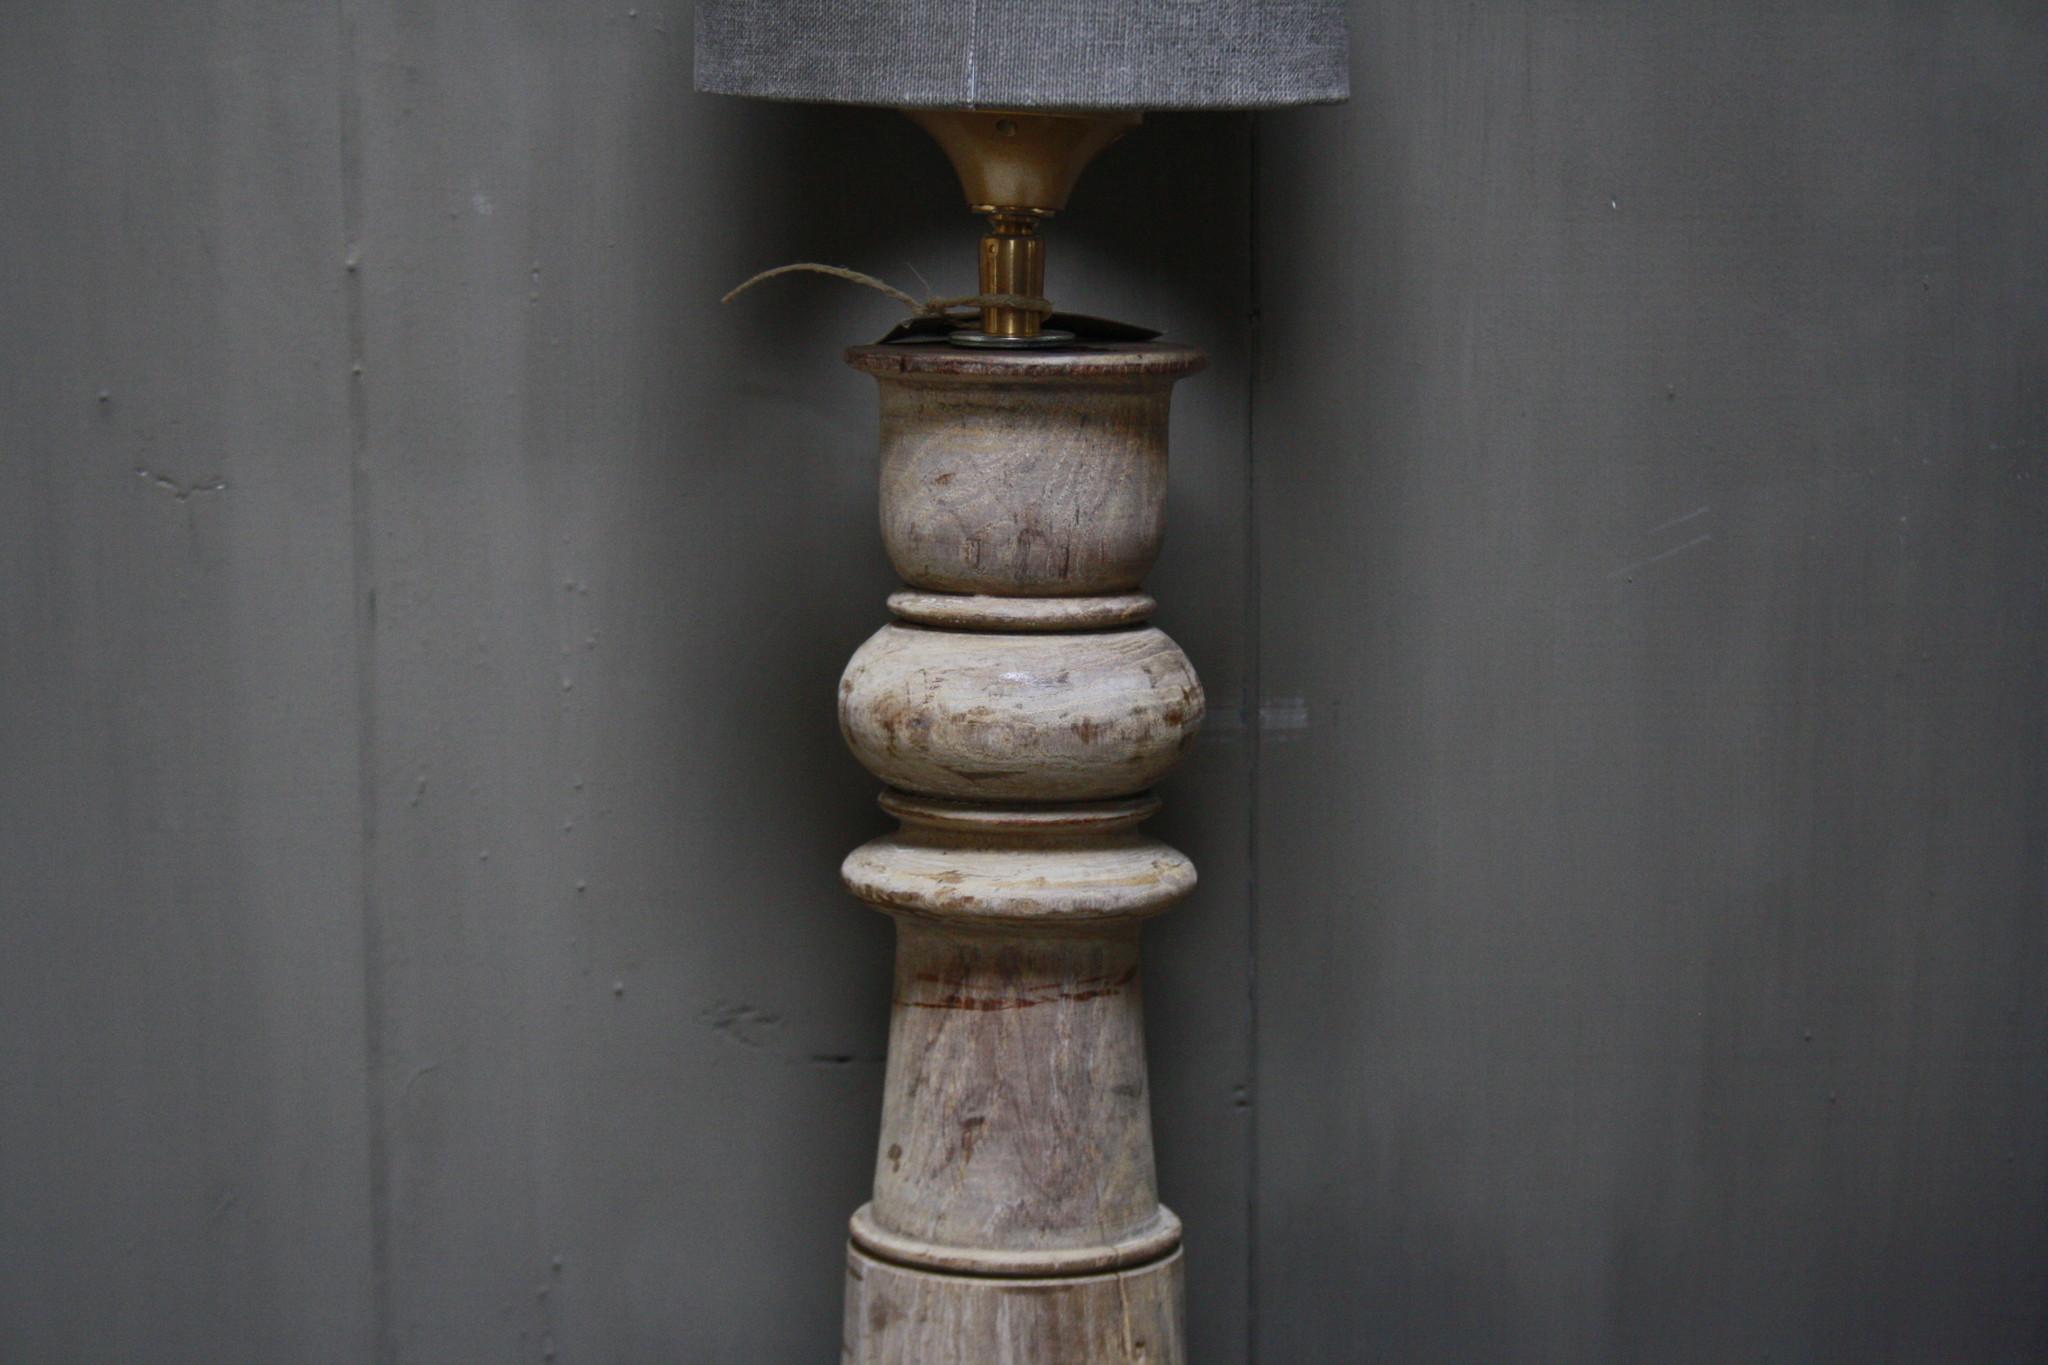 Aura peeperkorn oud houten baluster lamp 60 cm-4